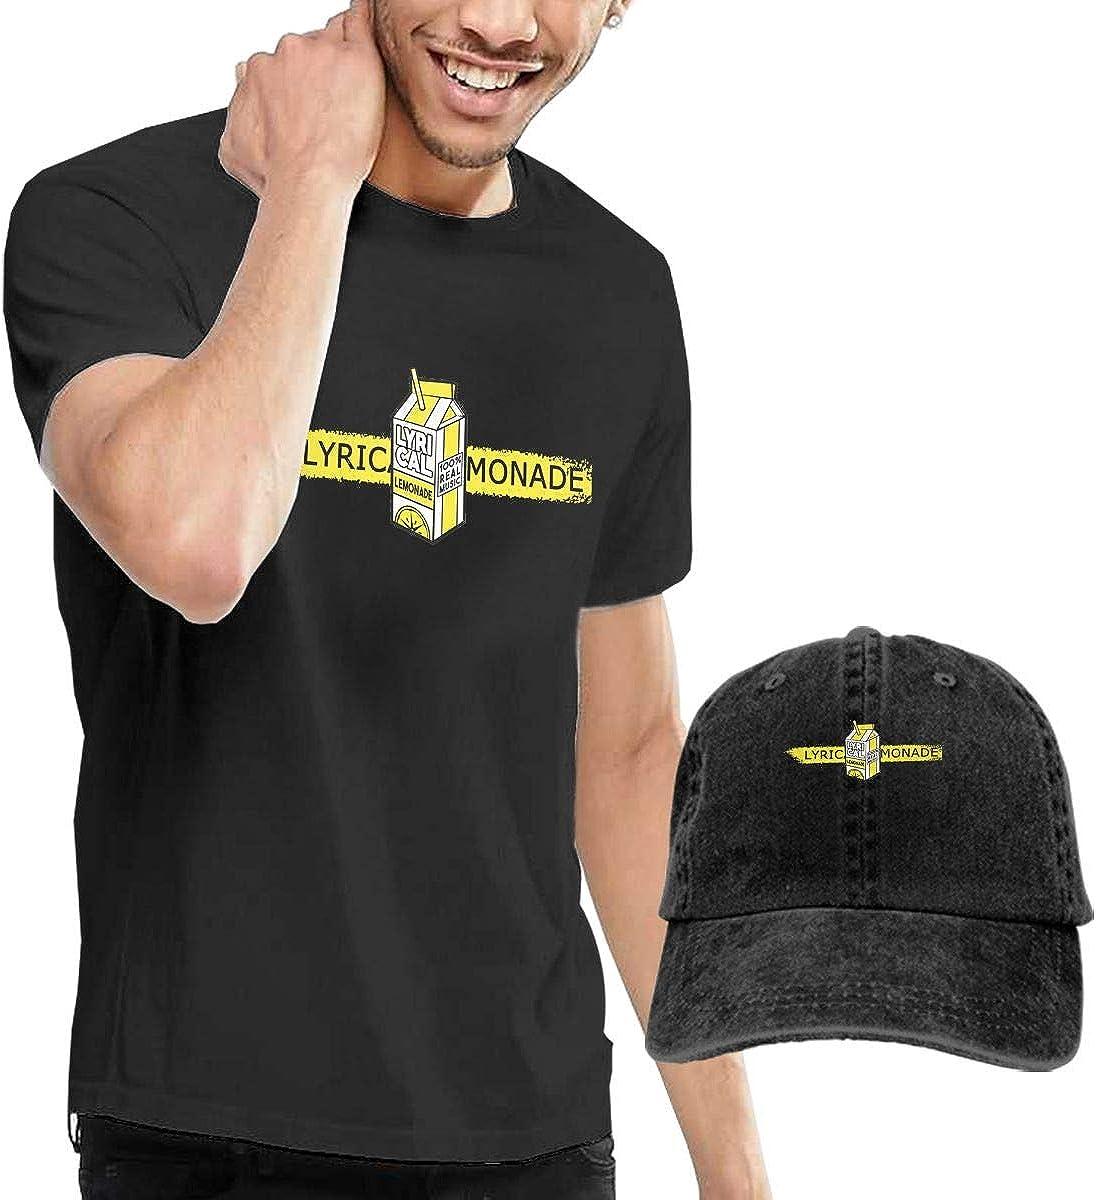 Men T Shirts Lyrical Lemonade Fashion Classical Tank Cowboy Caps Outdoor Caps